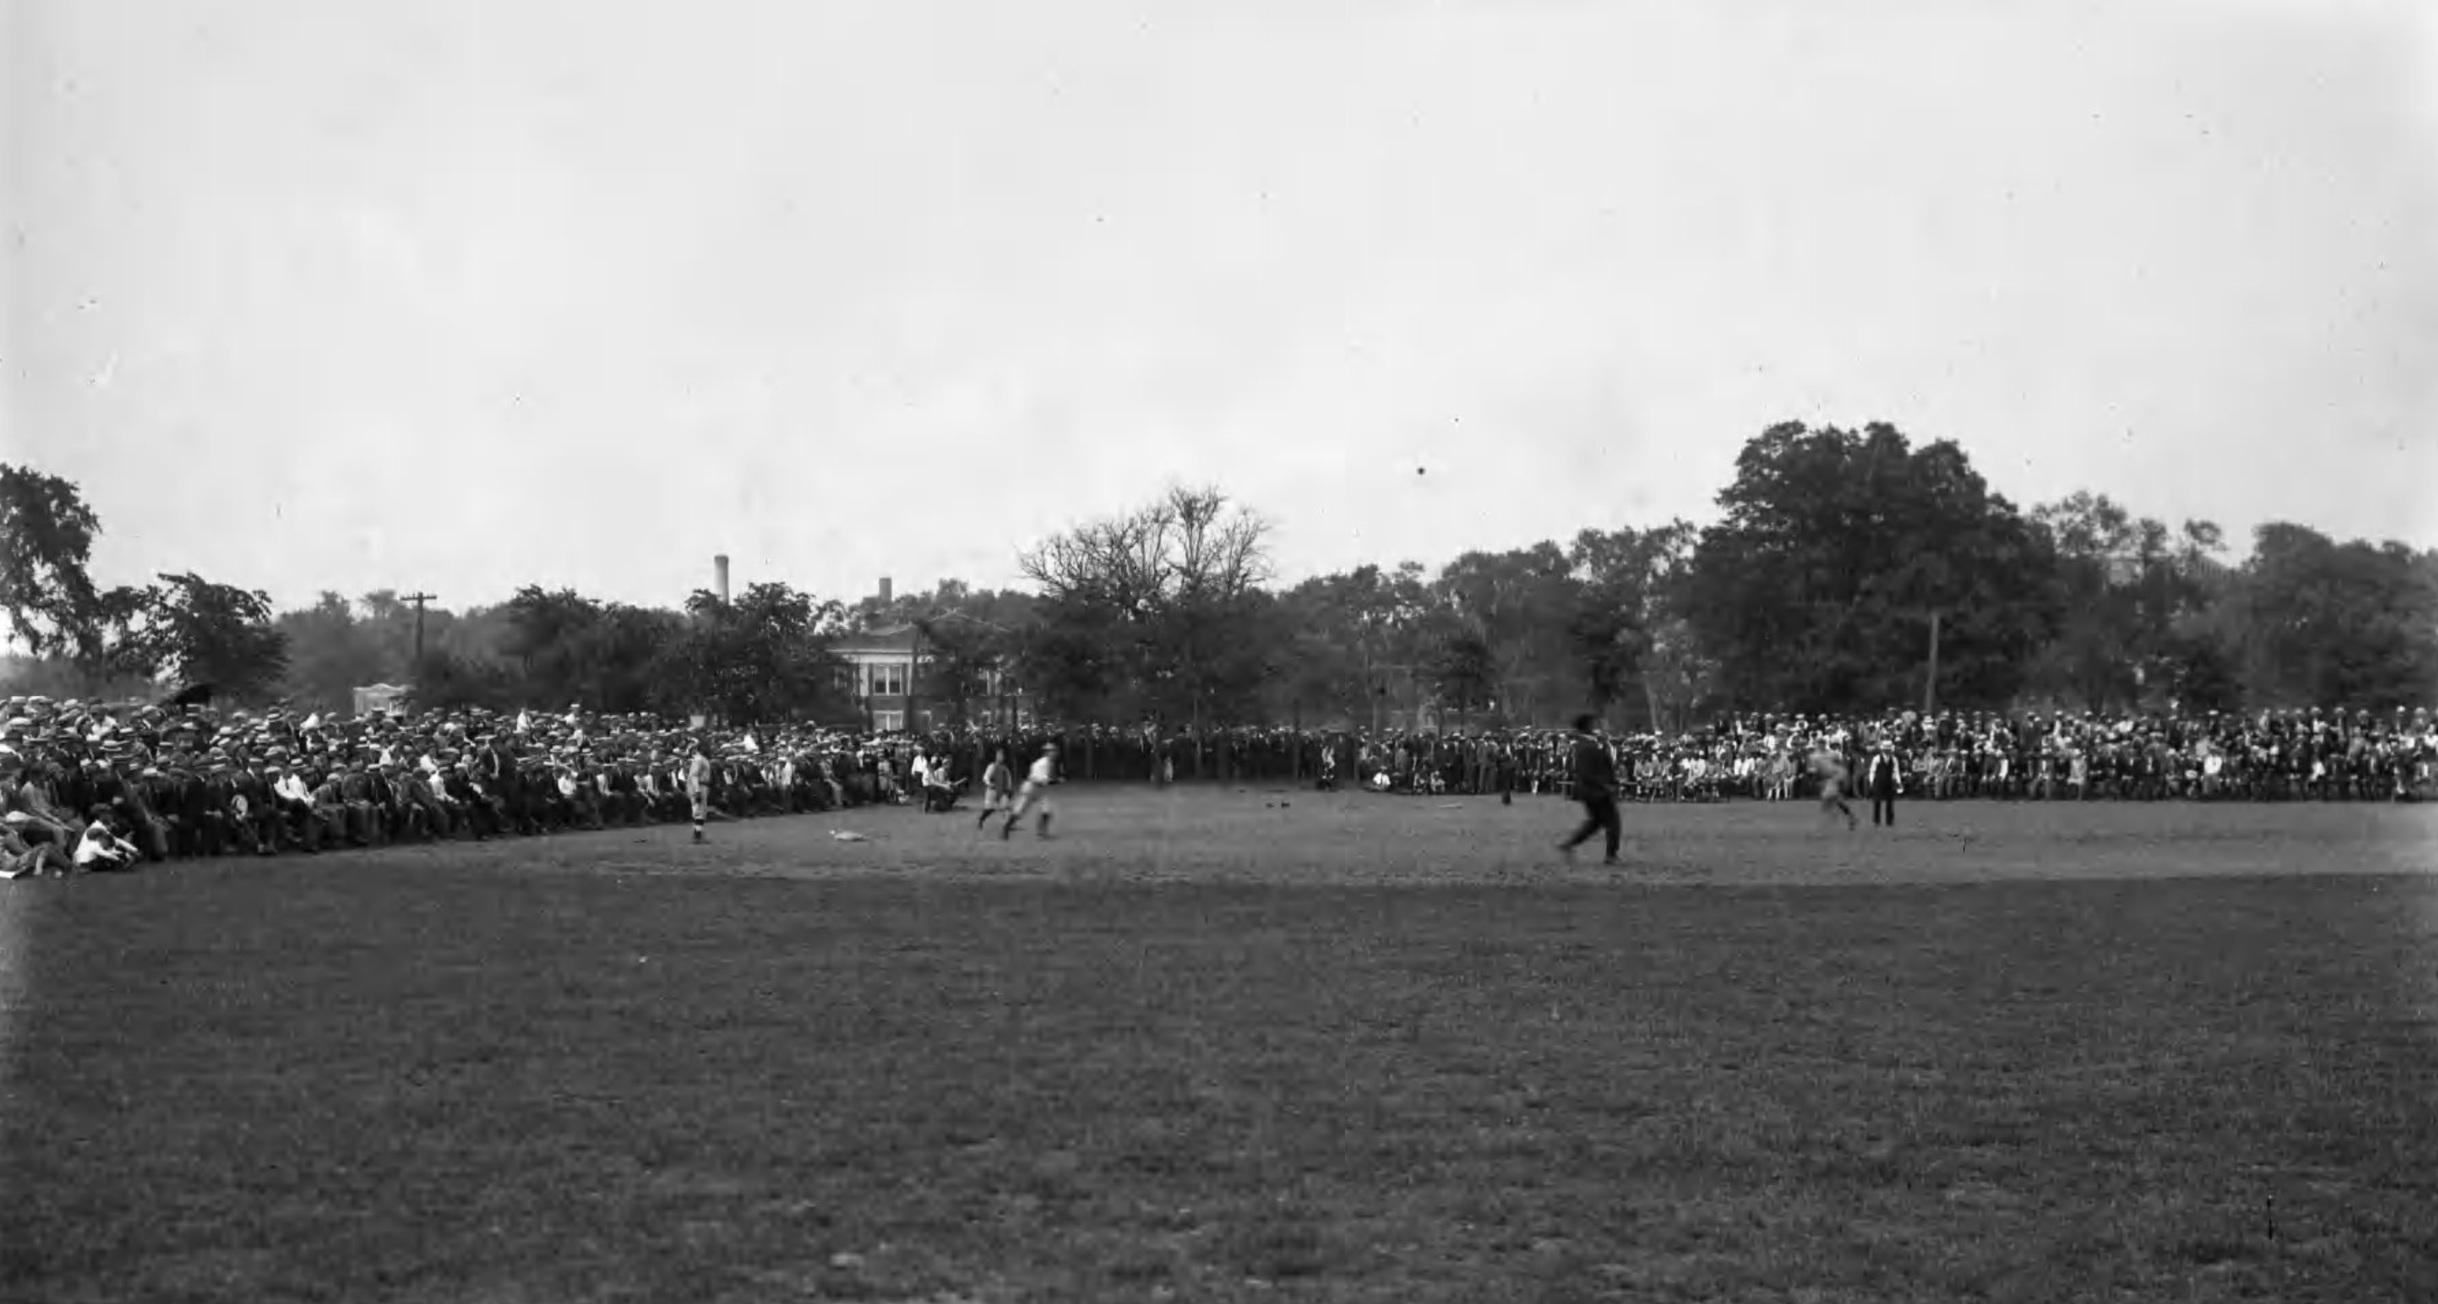 Baseball at Colt Park, 1926